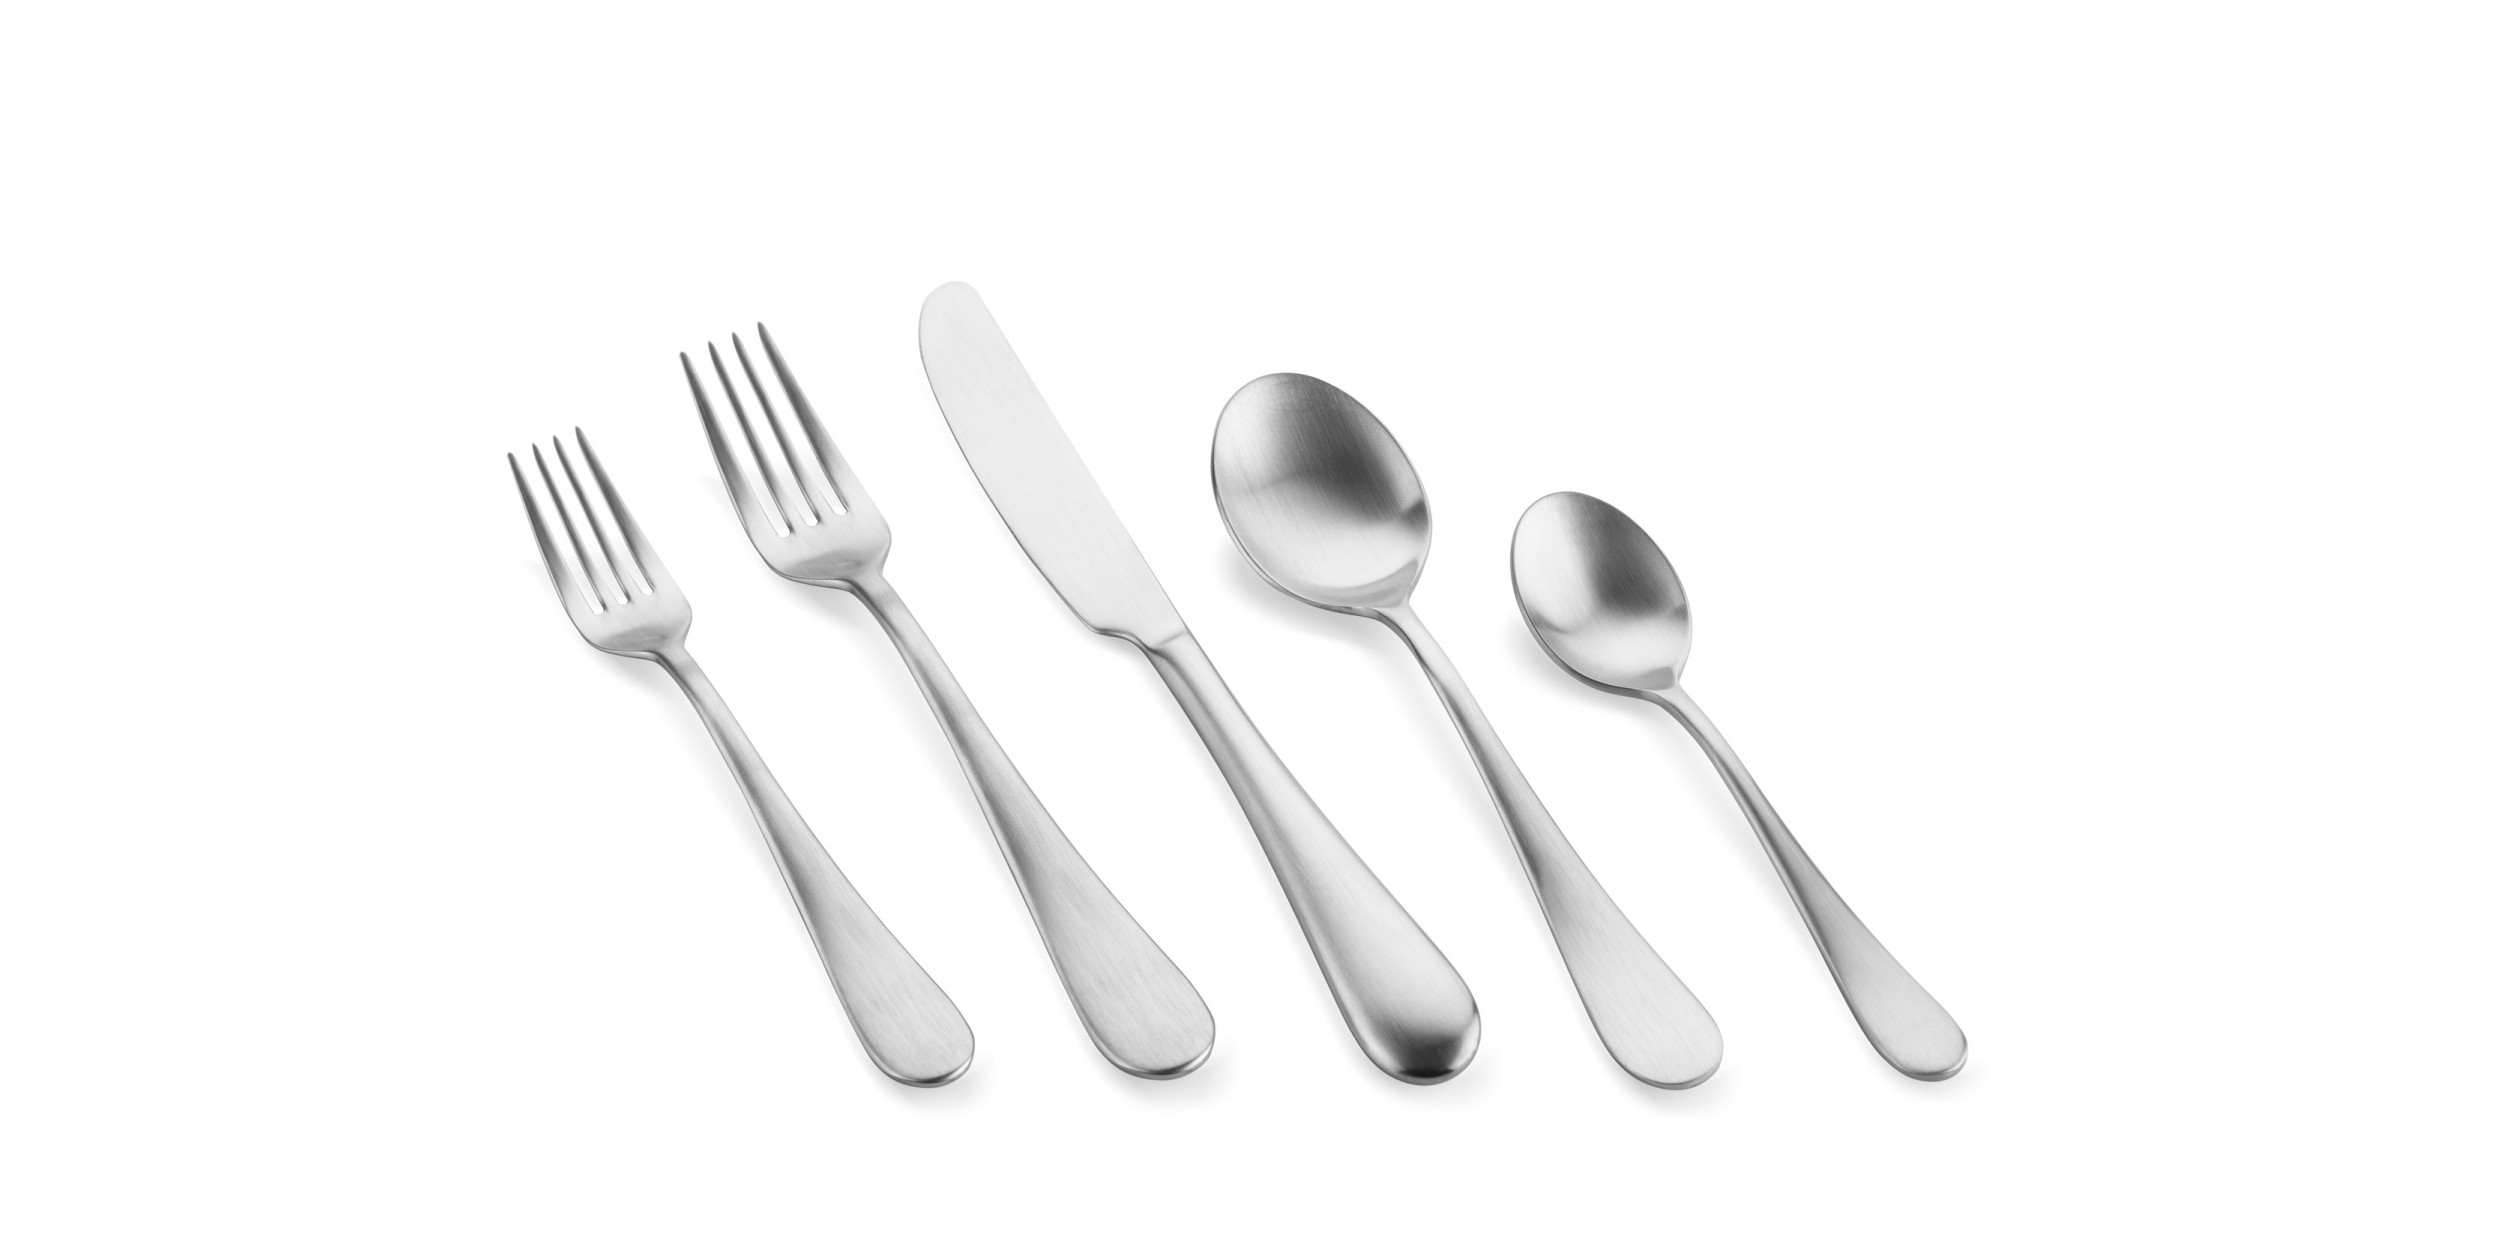 Mepra Stile Serving Fork 18//10 Stainless Steel by Pininfarina